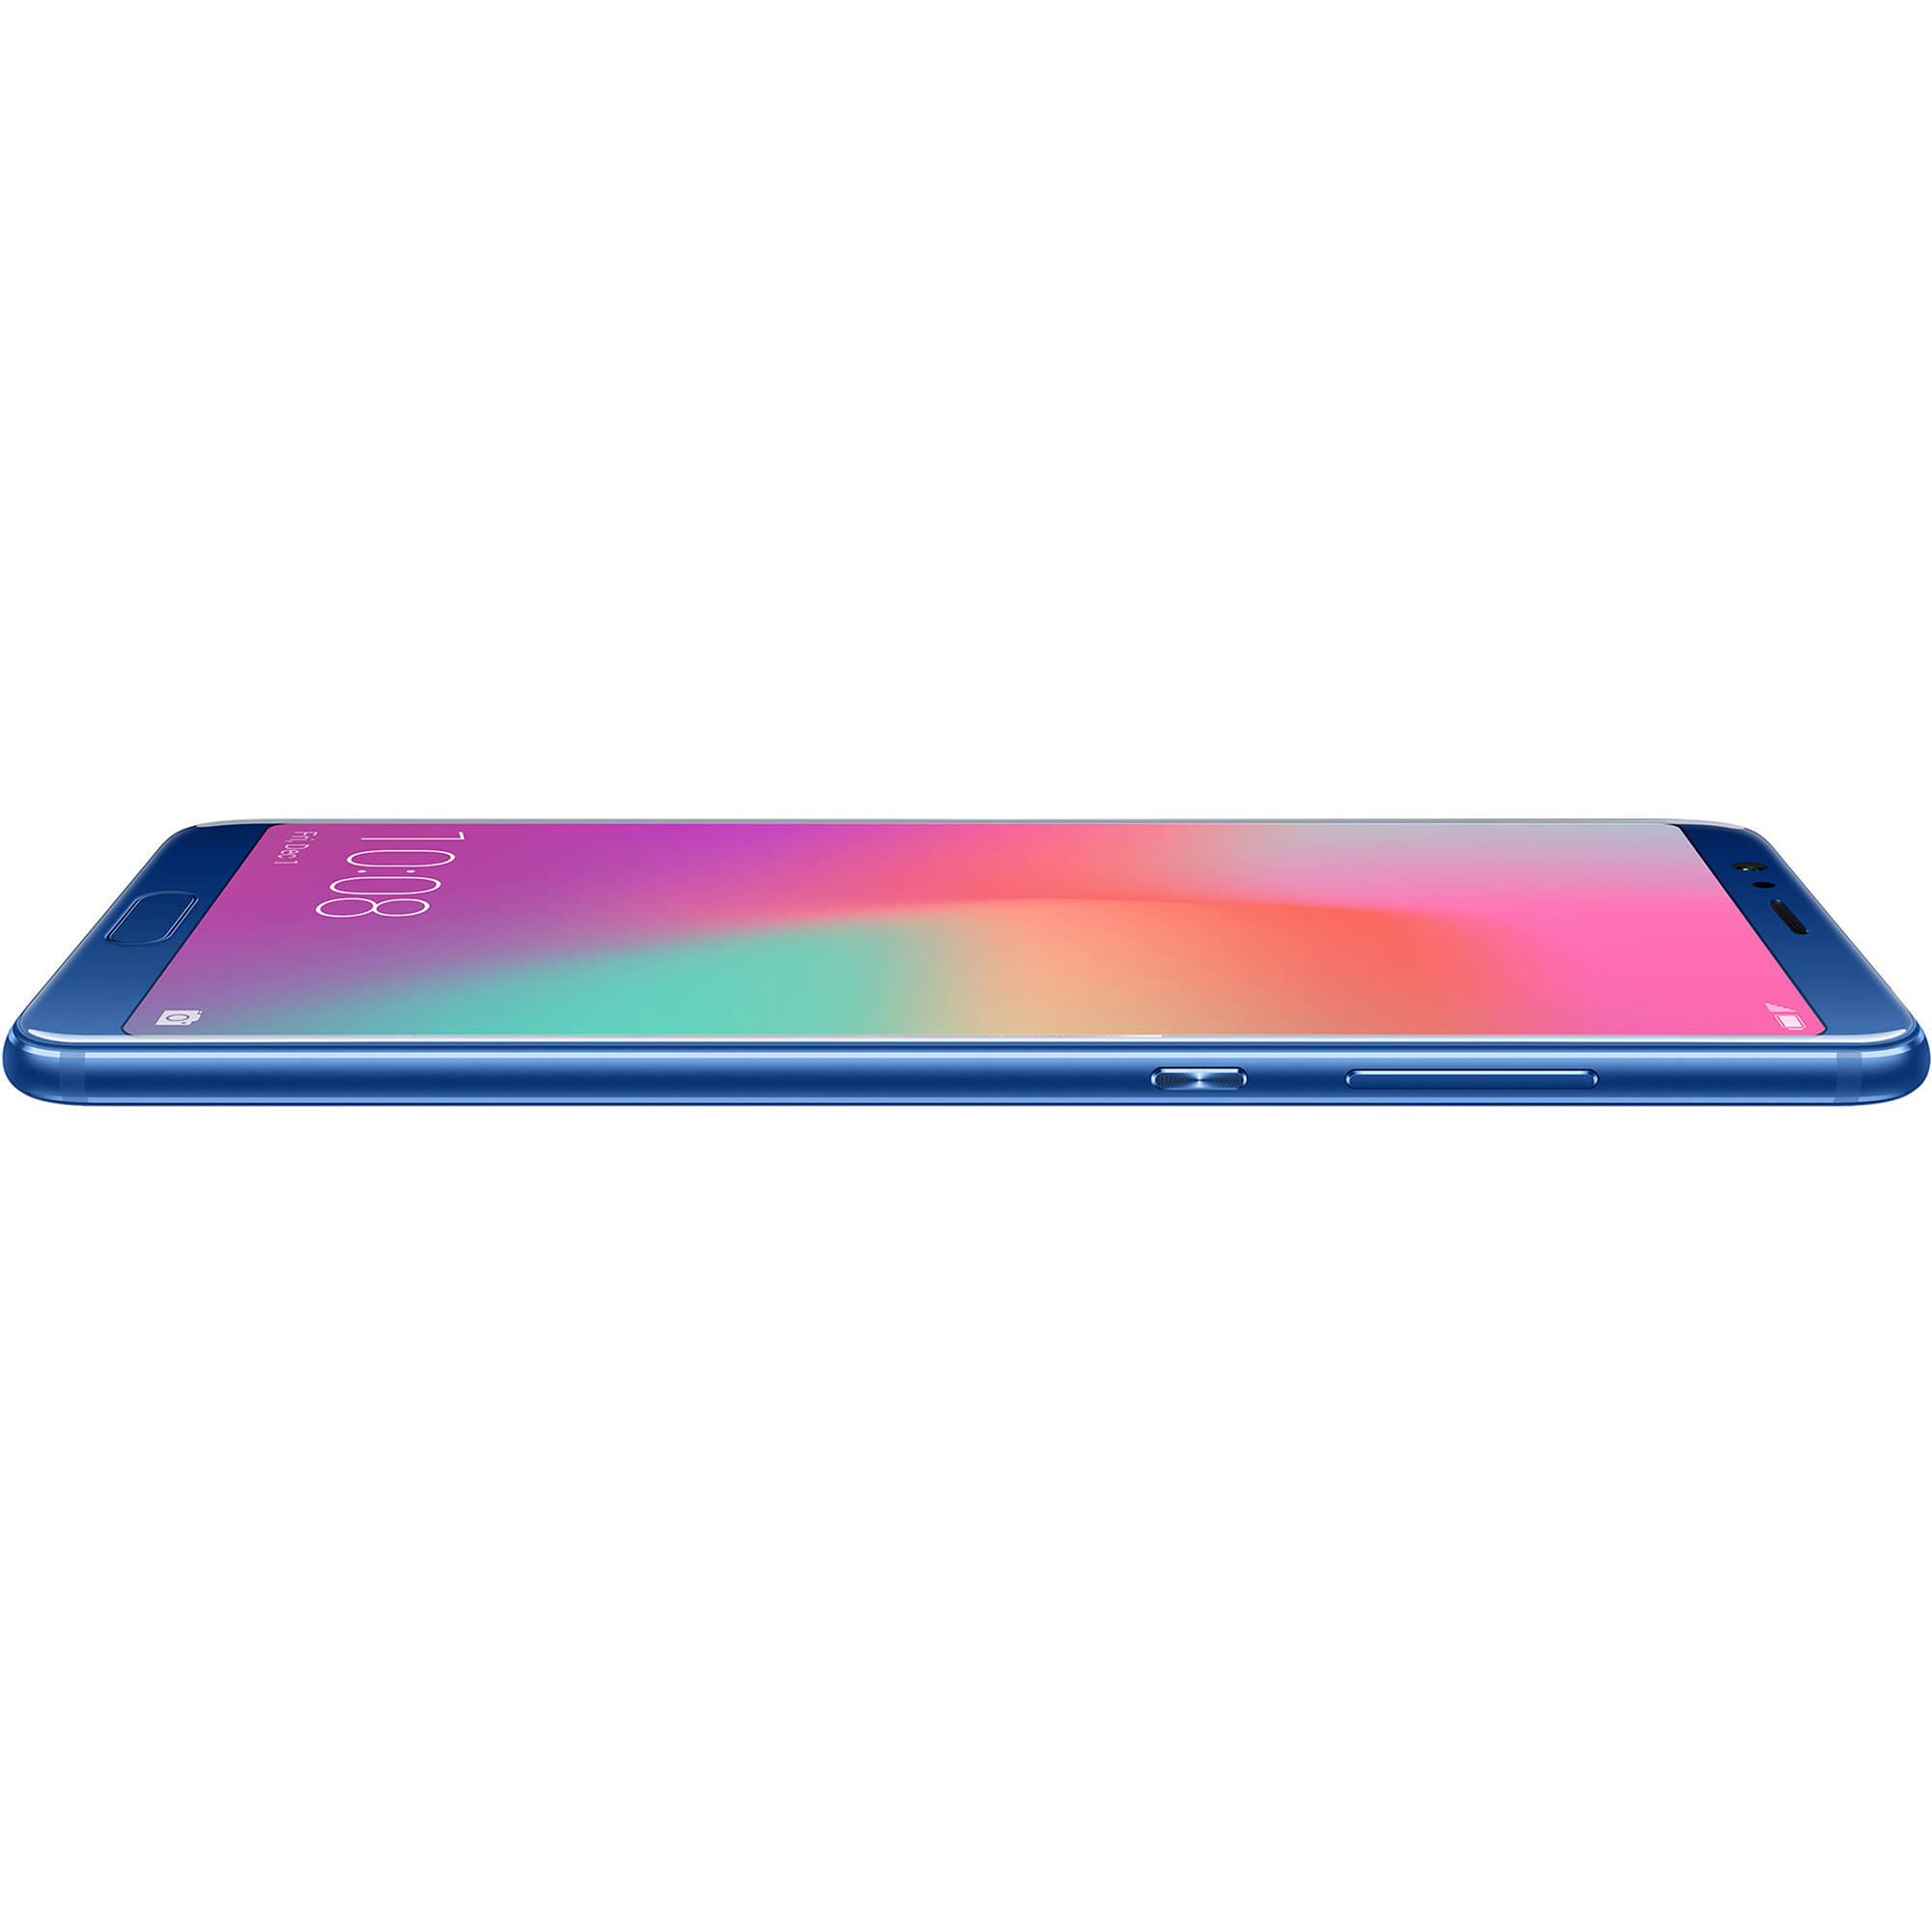 honor View10 128GB Smartphone (Unlocked, Navy Blue)